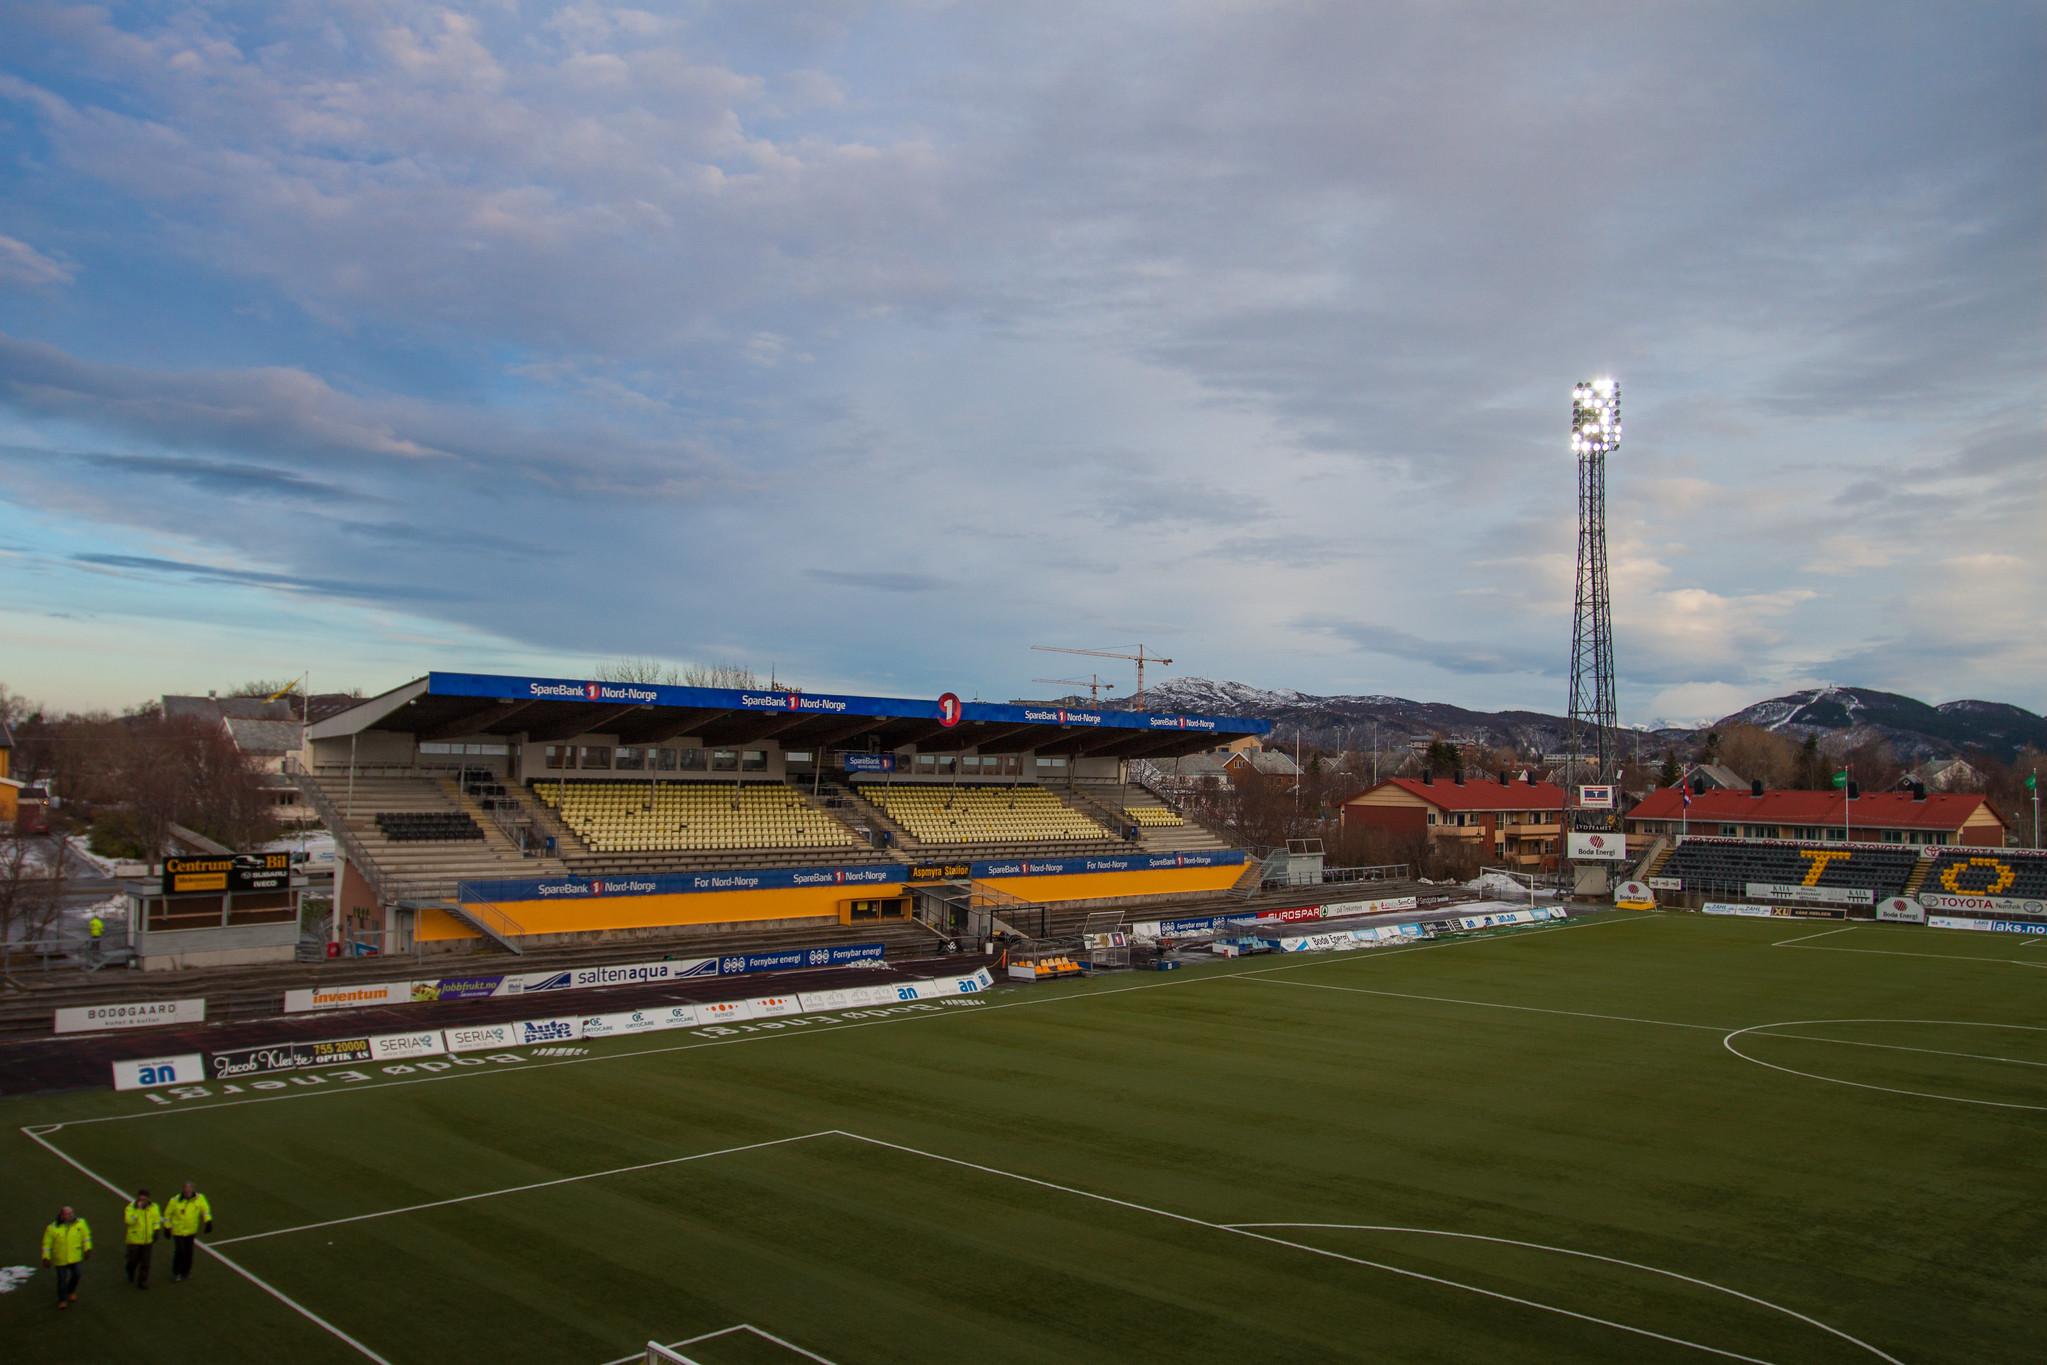 Aspmyra stadion, het stadion van FK Bodø/Glimt